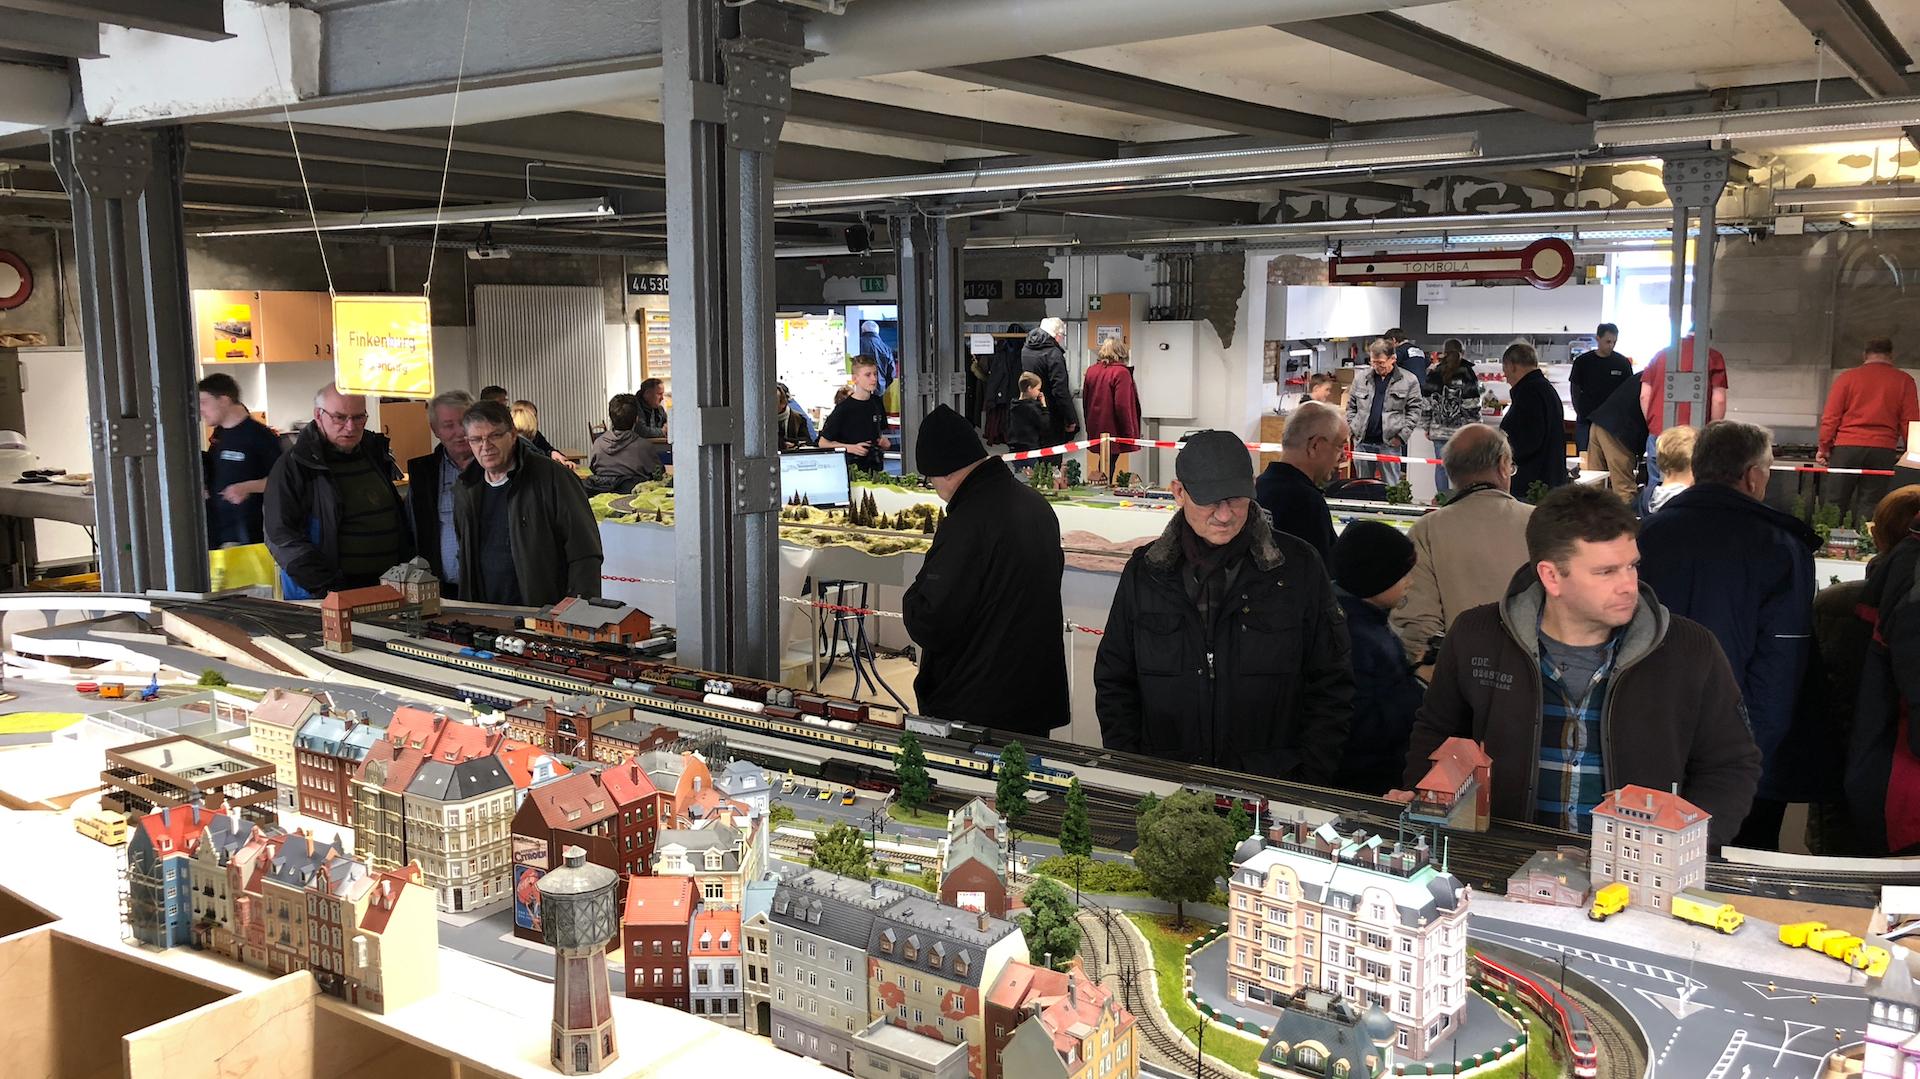 18_02_24_Schautag-Eisenbahnfreunde-Hameln_014